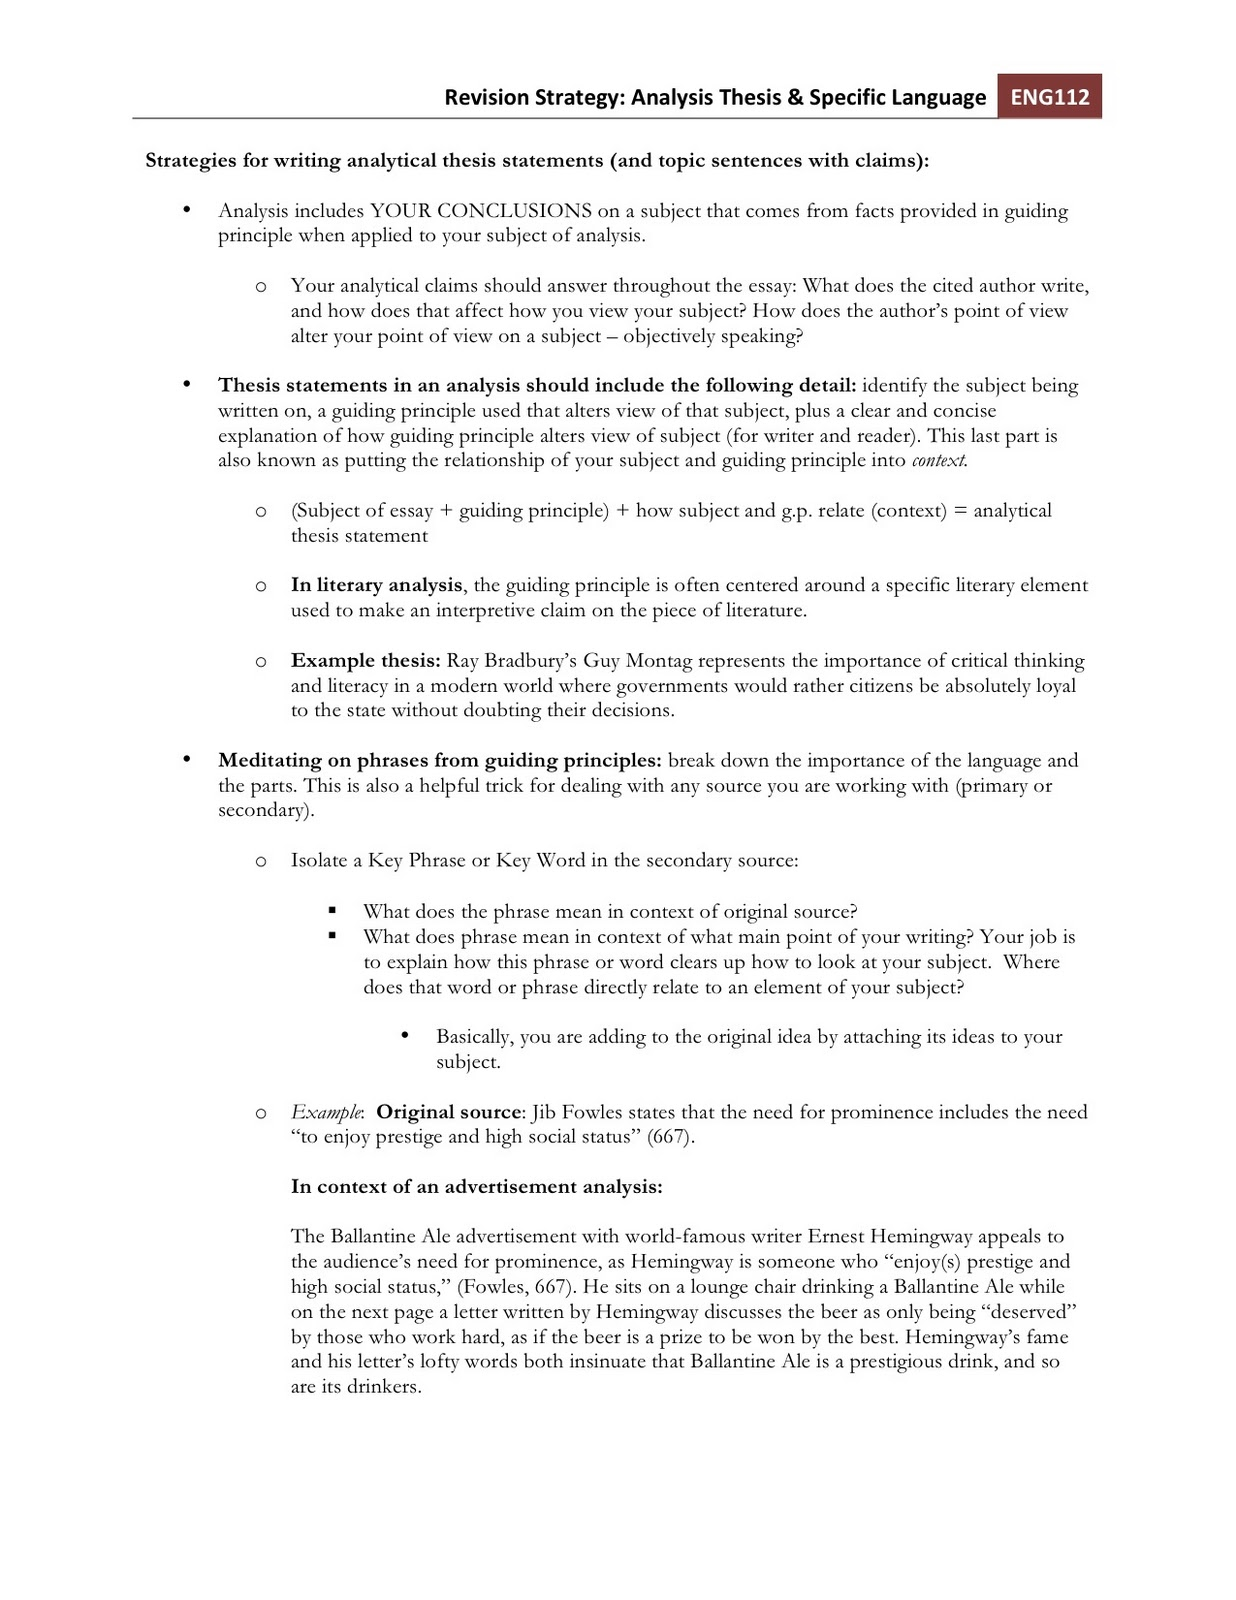 qcs analytical essay